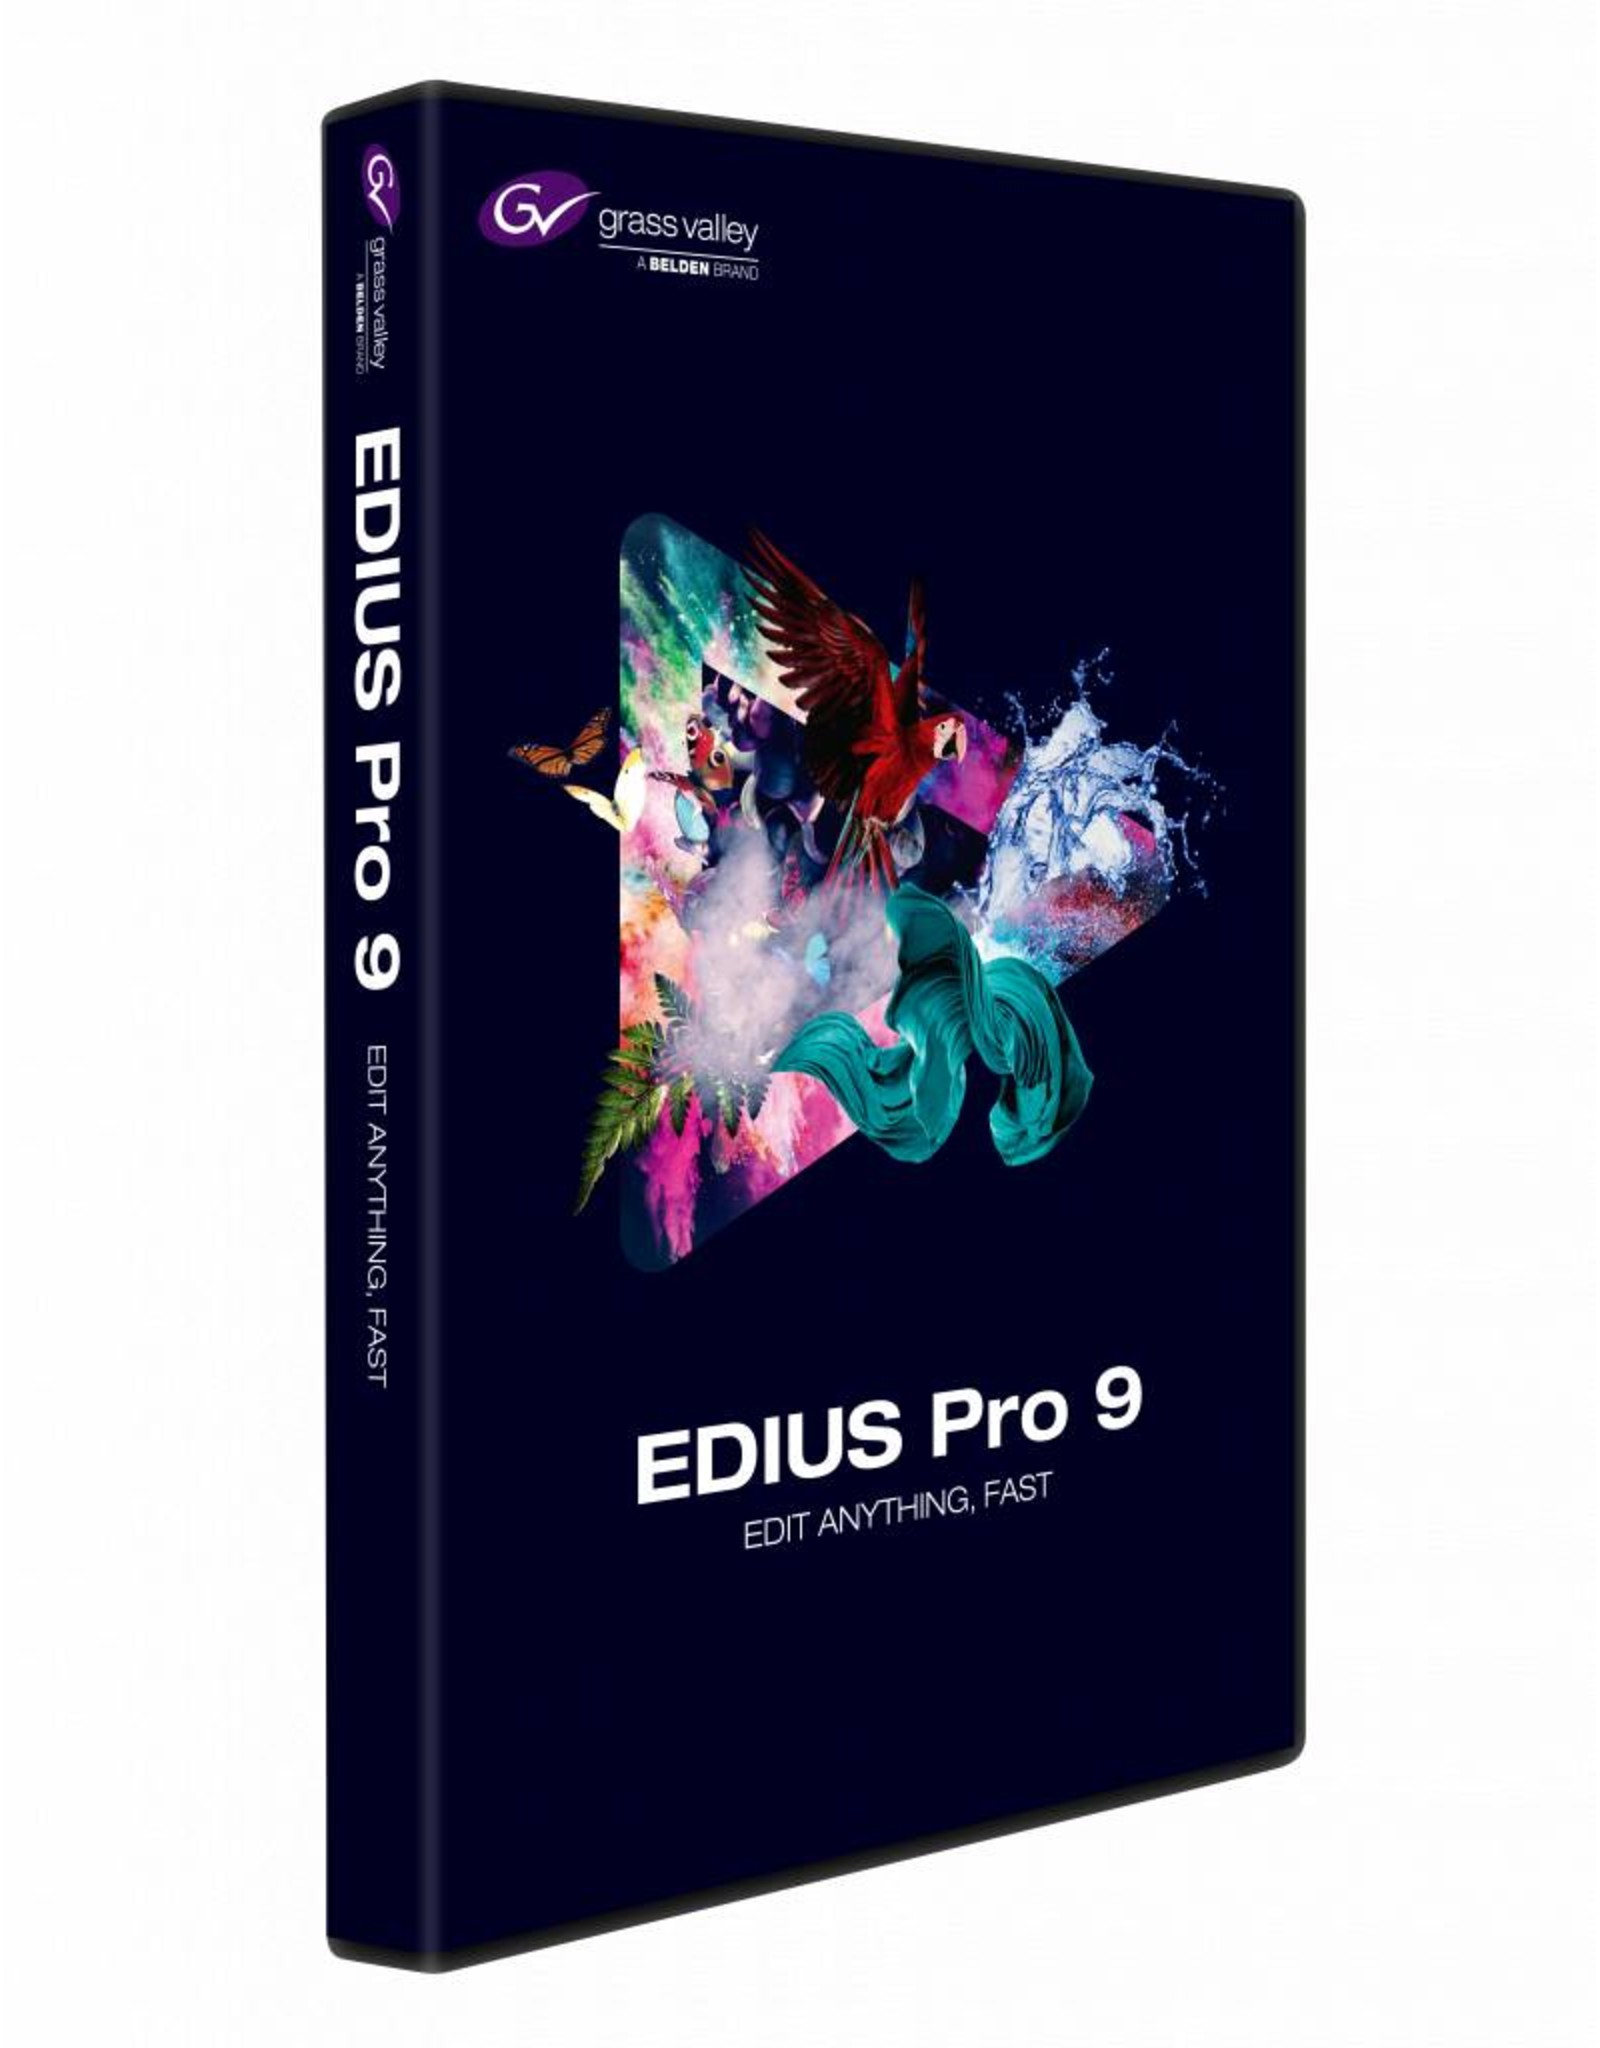 Grass Valley EDIUS Pro 9 Upgrade from Mync Standard